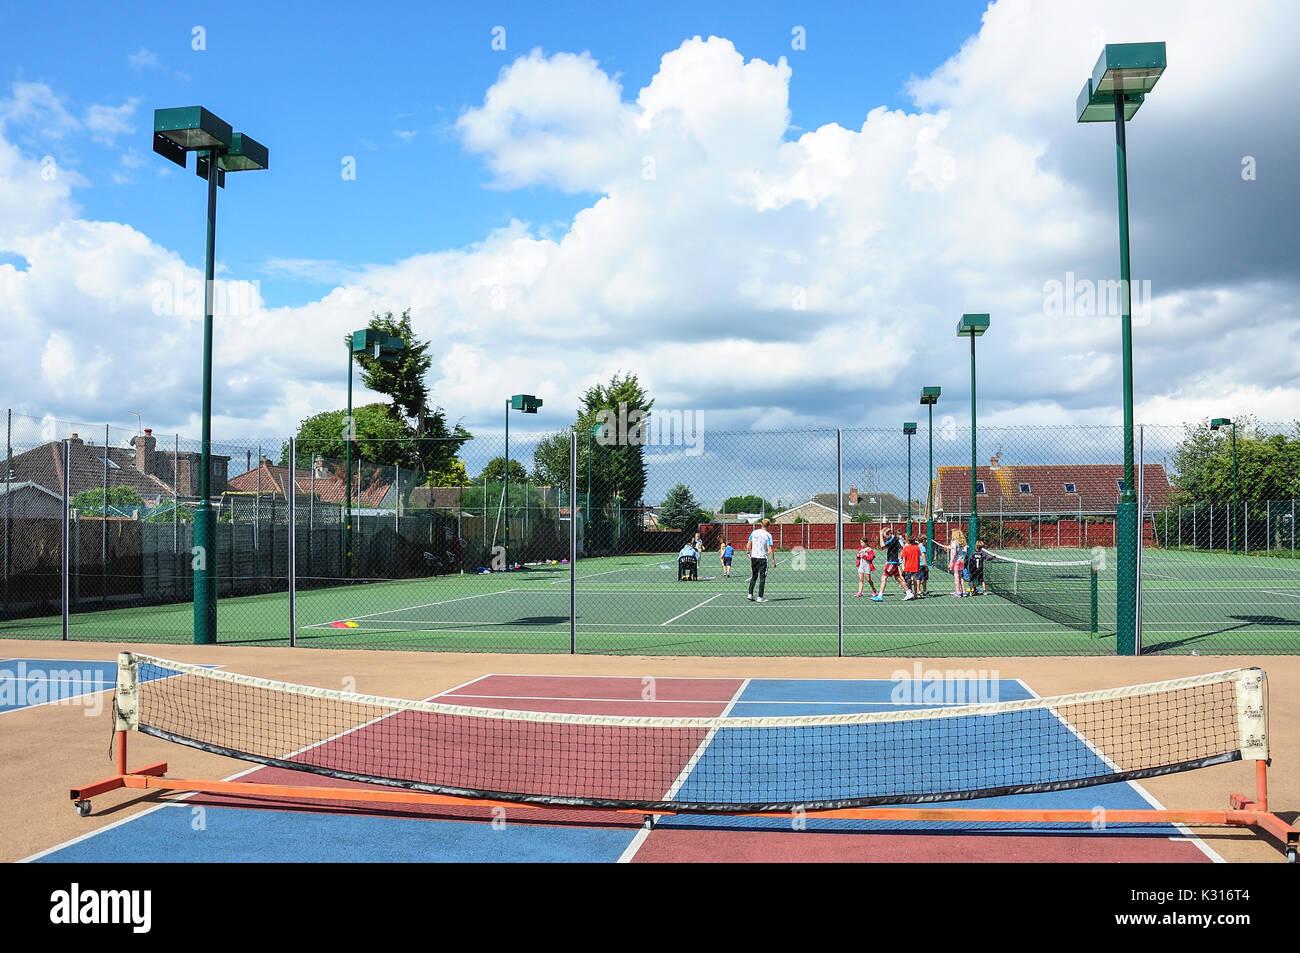 Kids summer tennis camp at Fordbridge Park, Ashford, Surrey, England, United Kingdom - Stock Image